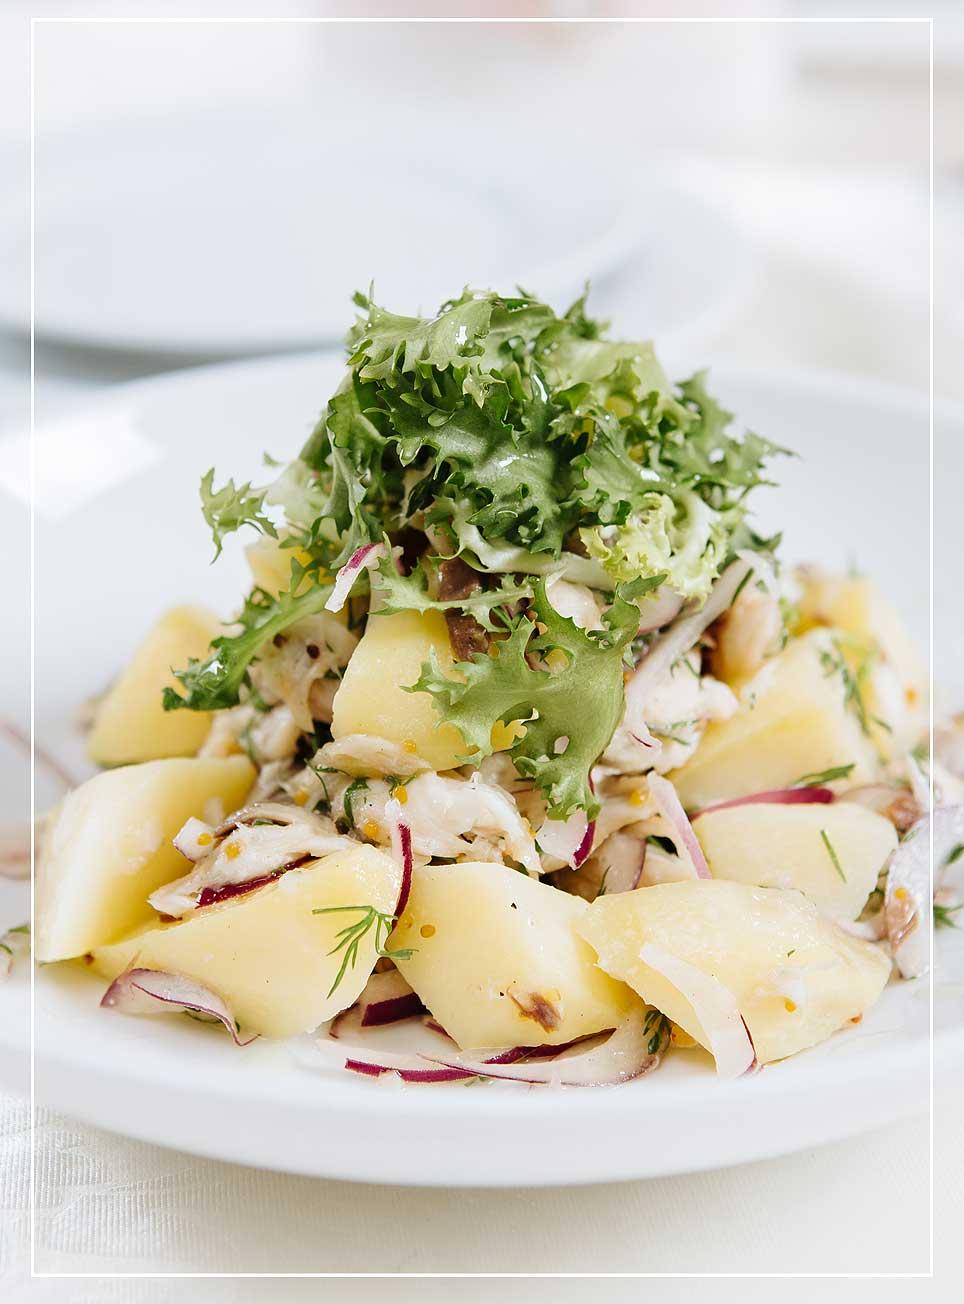 Lauwarmer Kartoffelsalat mit geräuchter Makrele